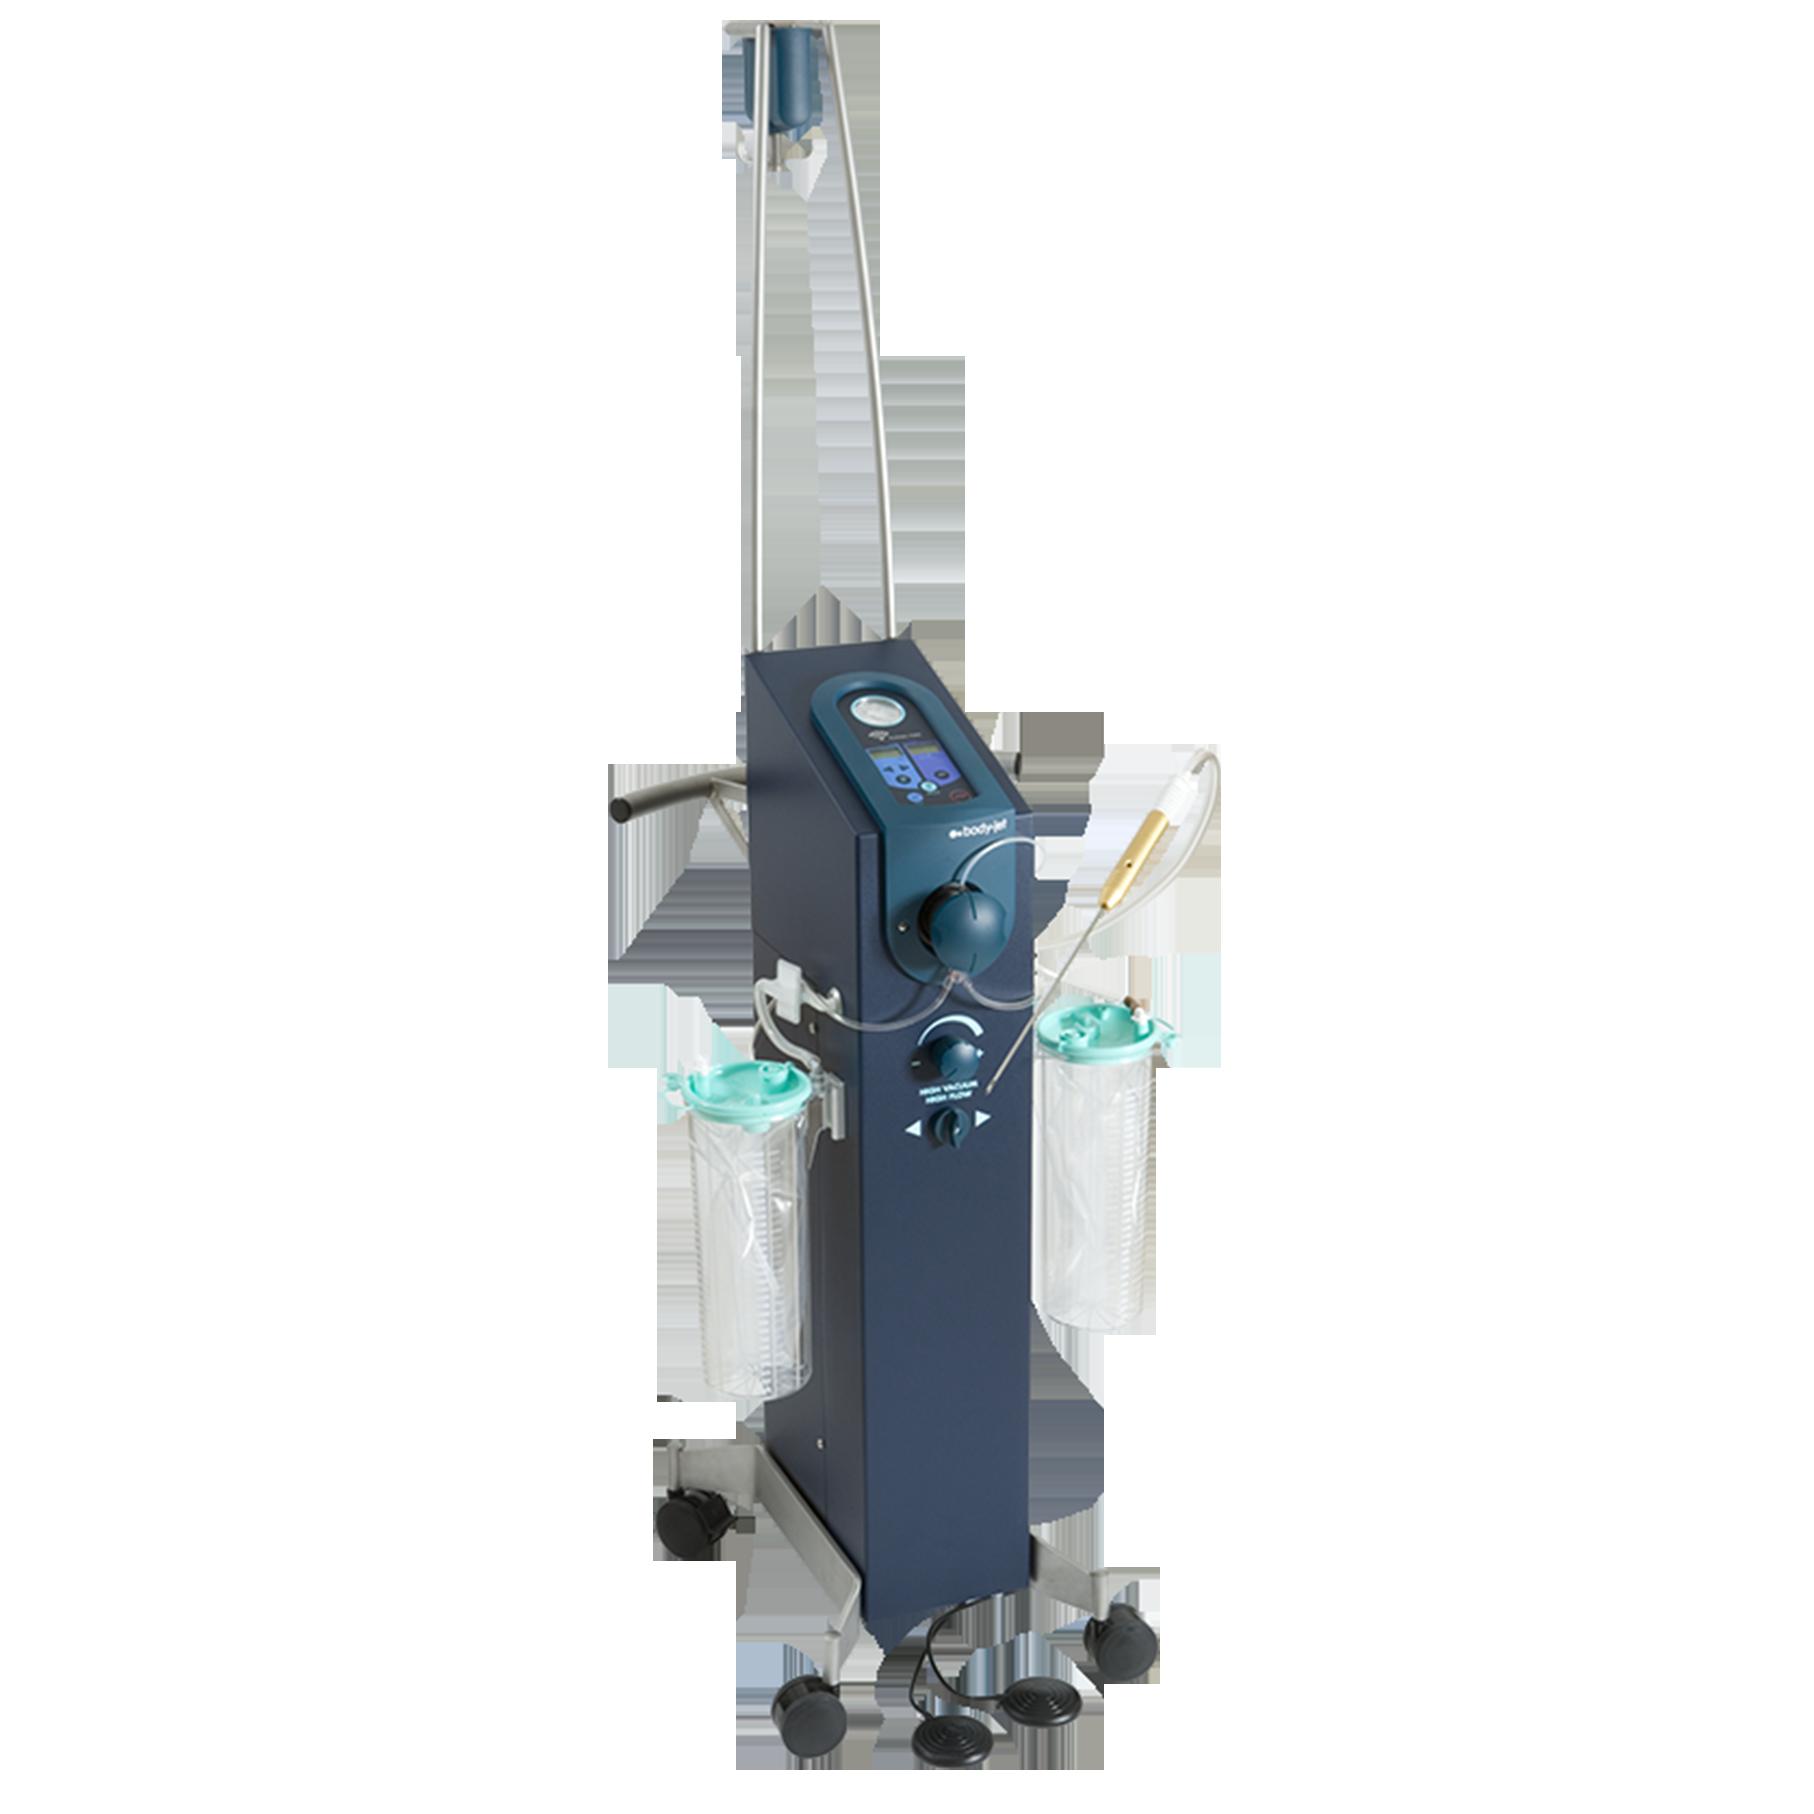 Body-jet水动力辅助吸脂系统 德国原装进口 吸脂 丰胸丰臀 面部填充 脂肪再生细胞